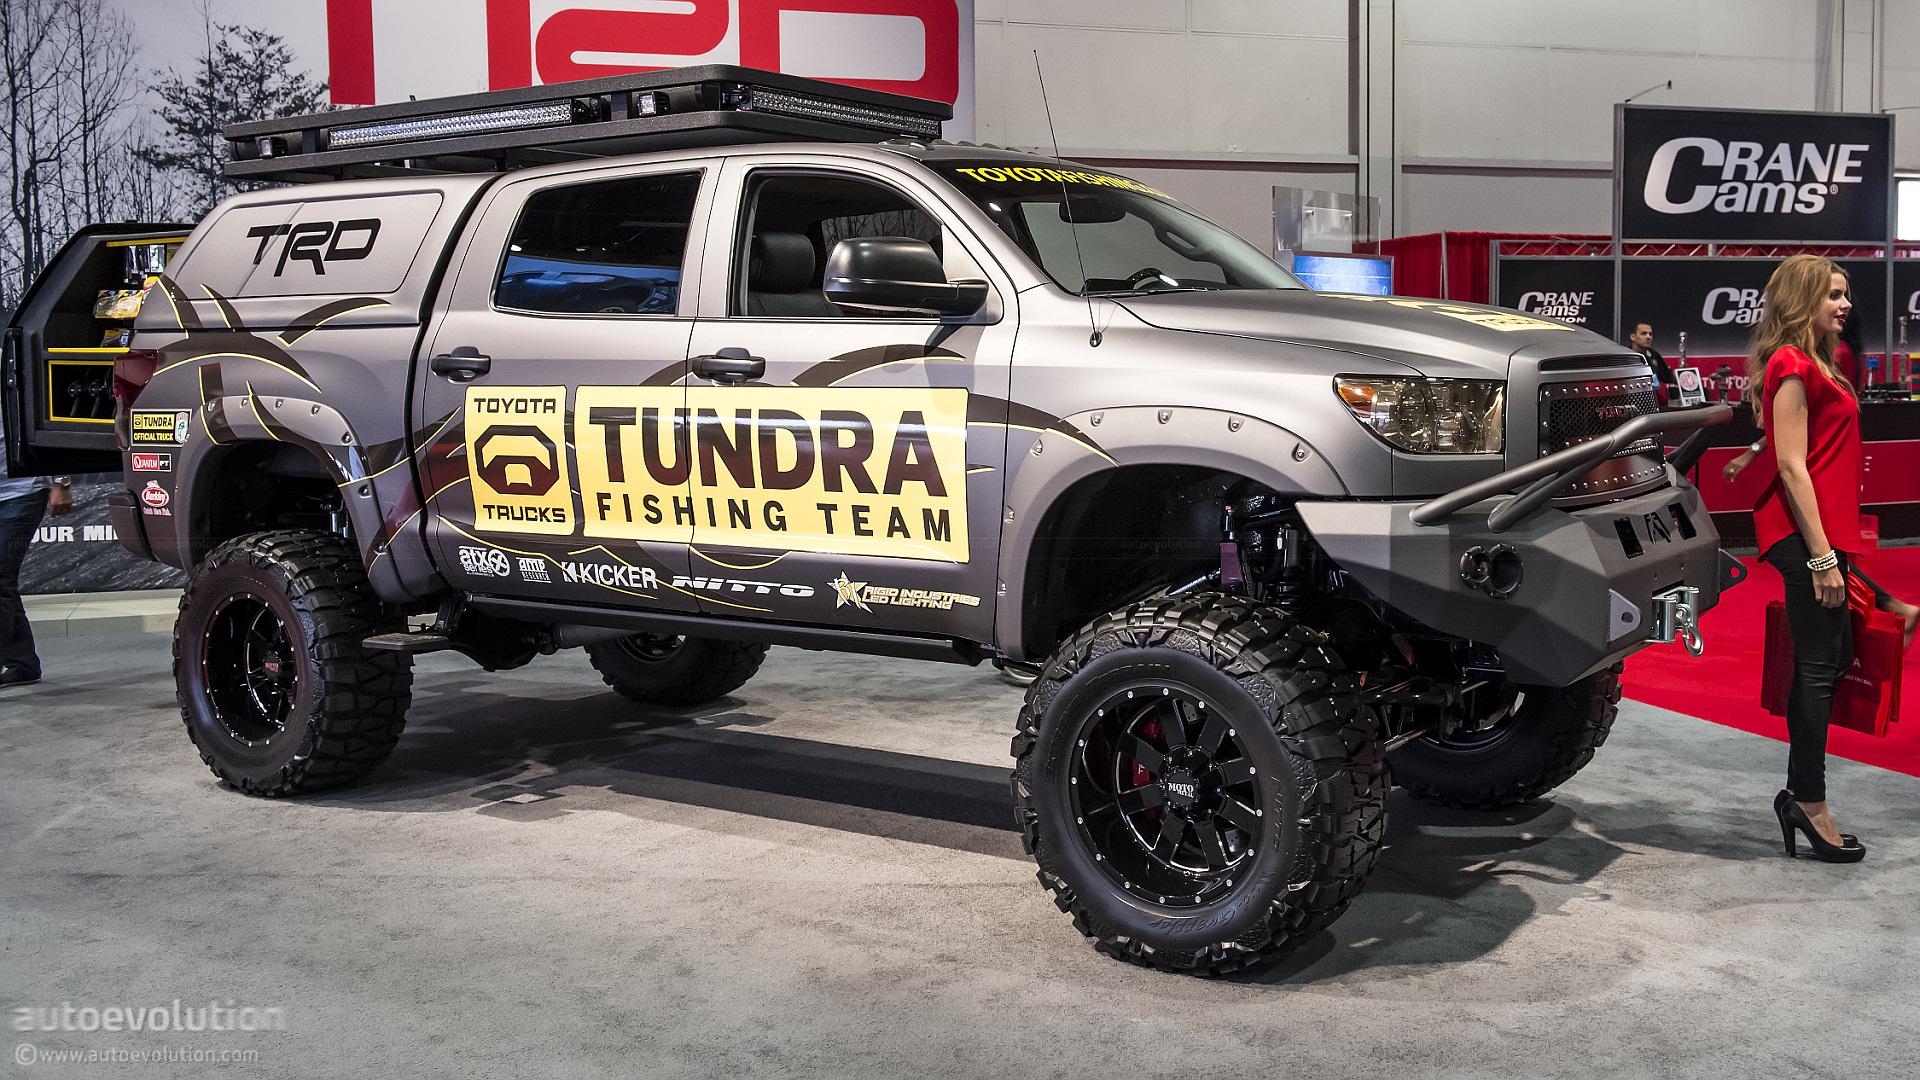 2012 Sema Toyota Ultimate Fishing Tundra Live Photos